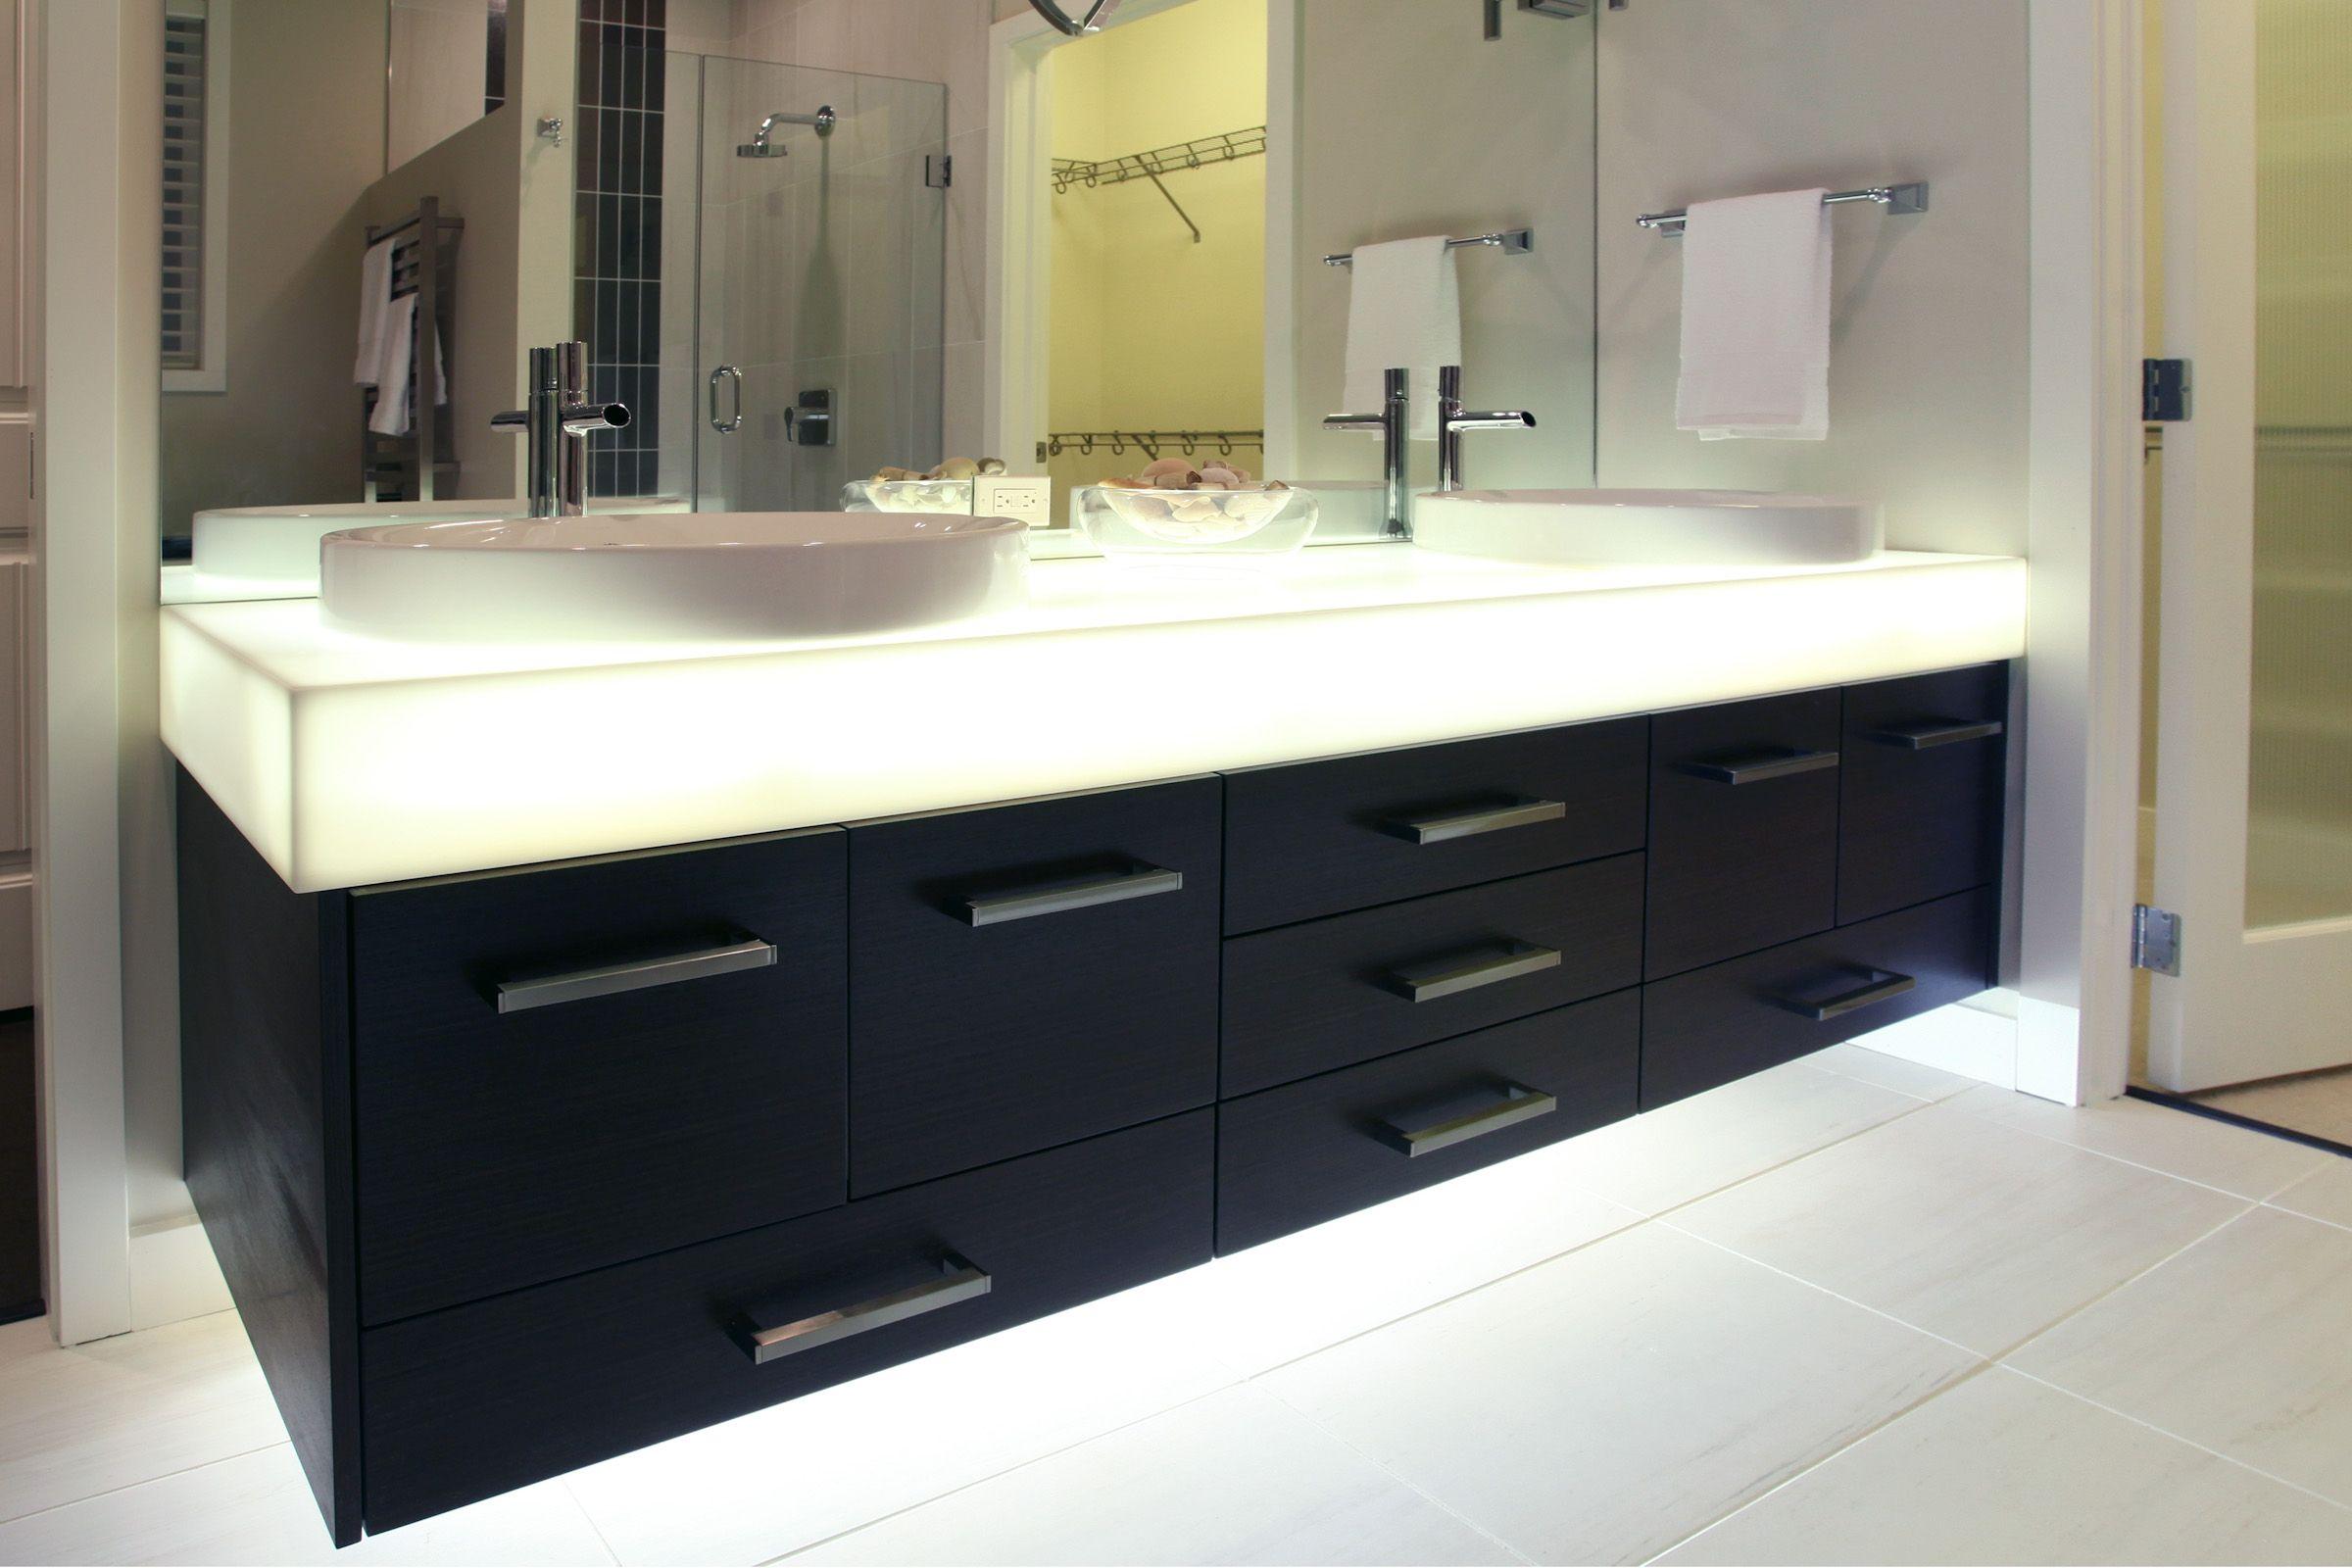 Dupont corian illumination series countertop corian - Solid surface bathroom countertops ...